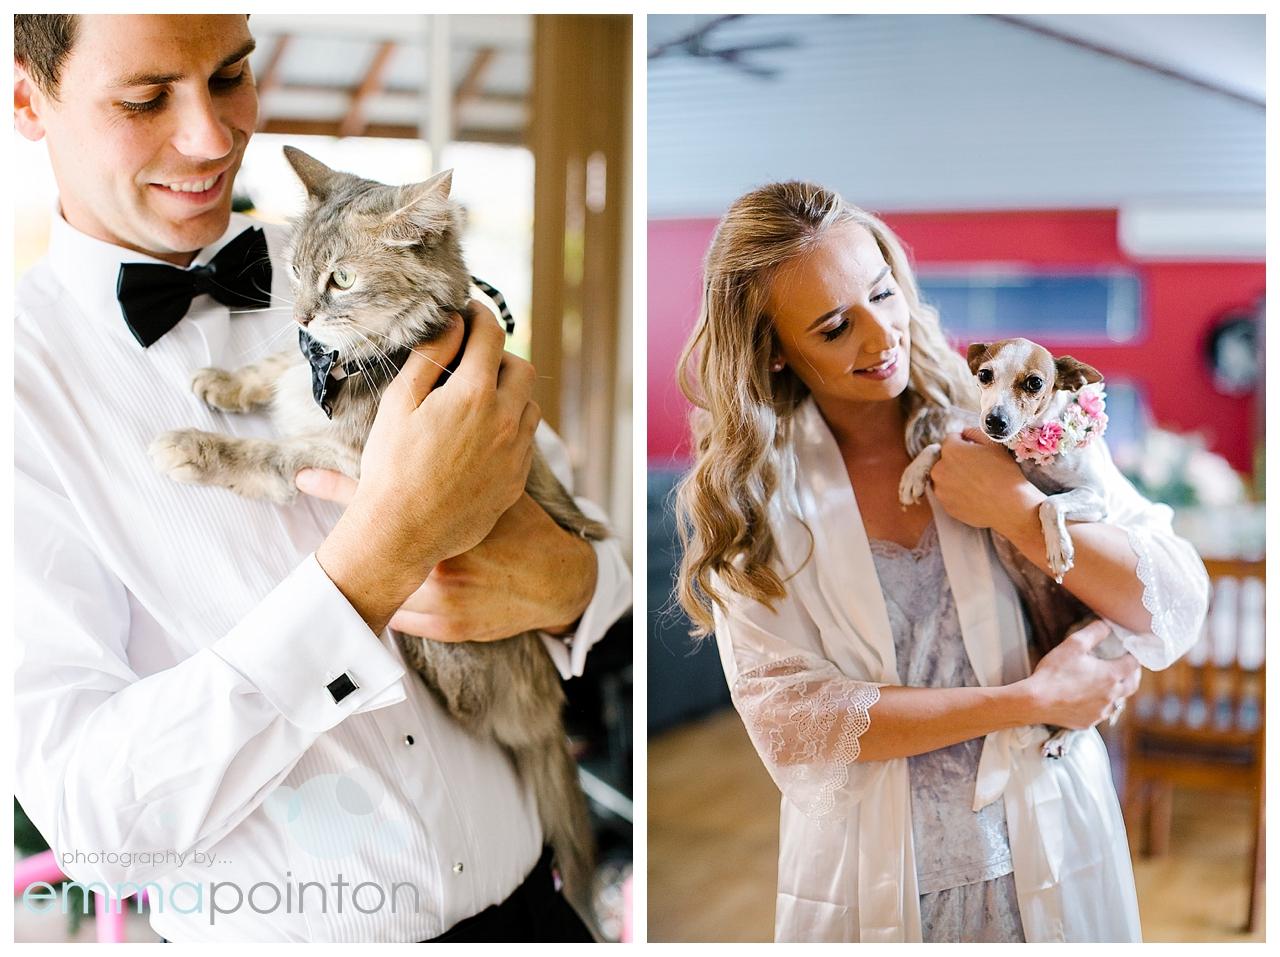 Wedding portraits with pets